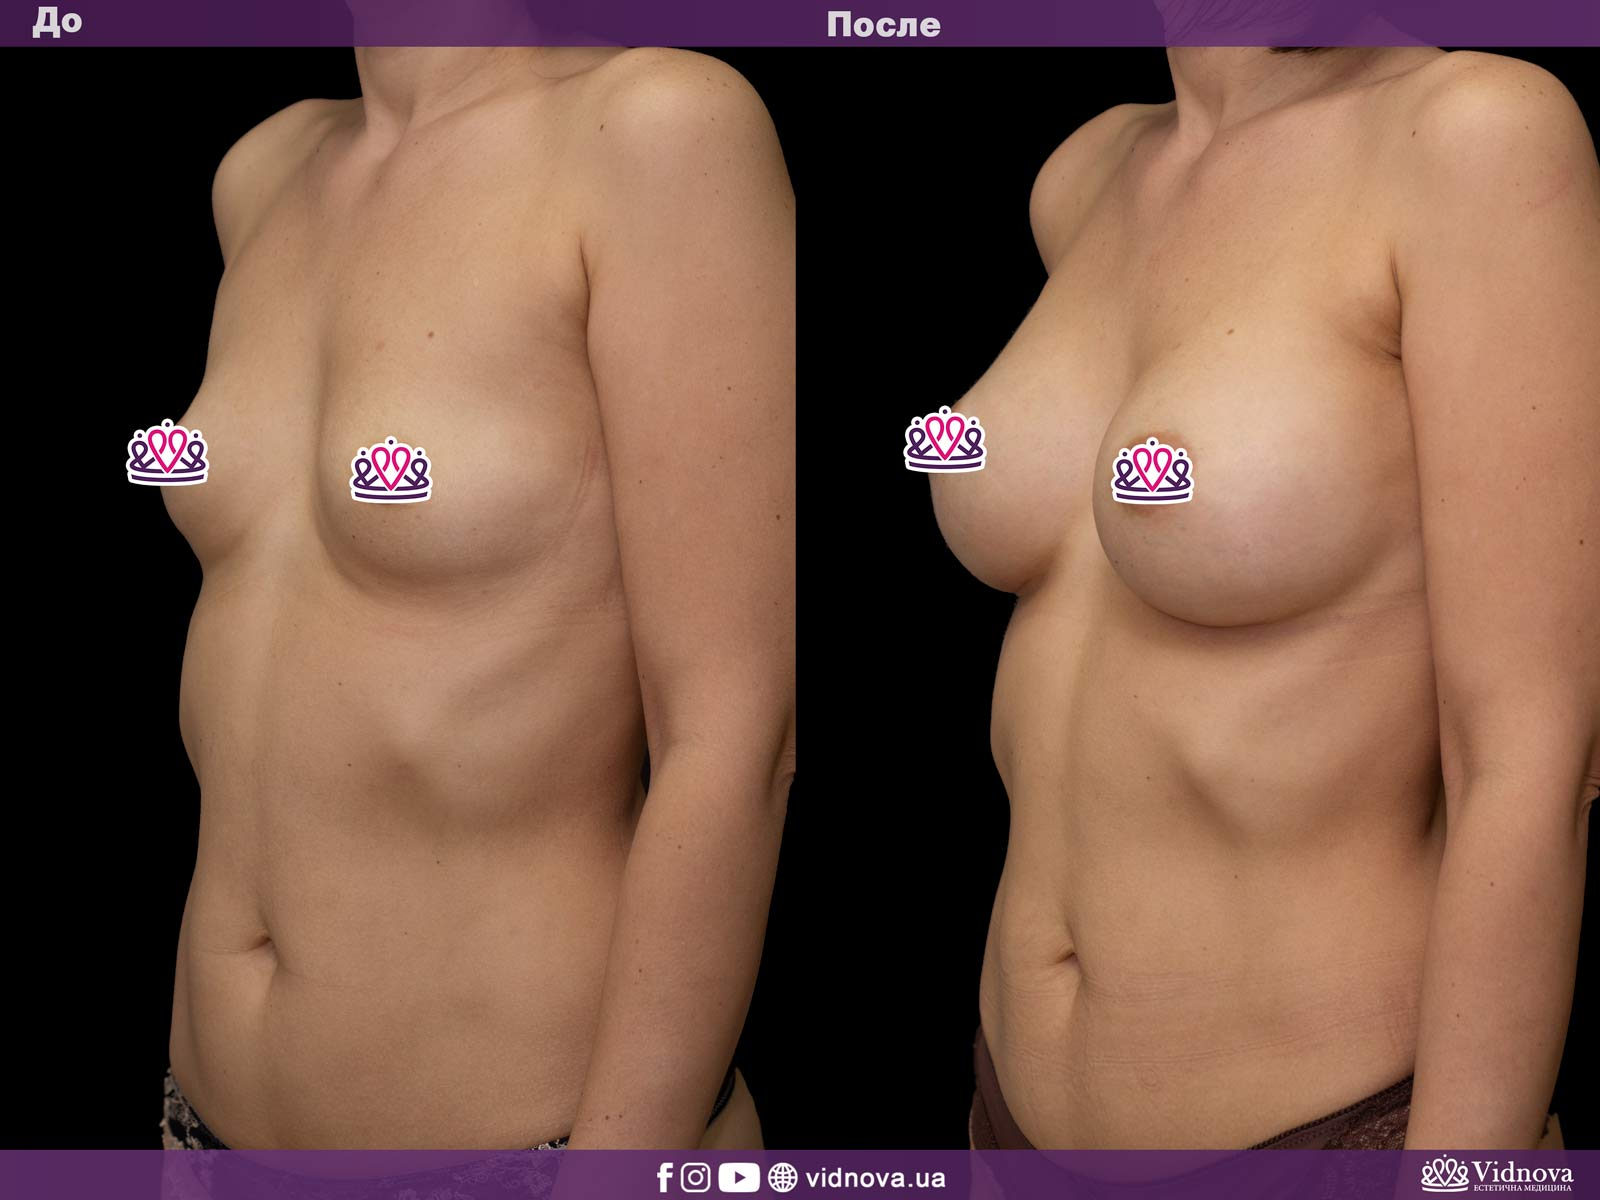 Увеличение груди: Фото ДО и ПОСЛЕ - Пример №15-2 - Клиника Vidnova